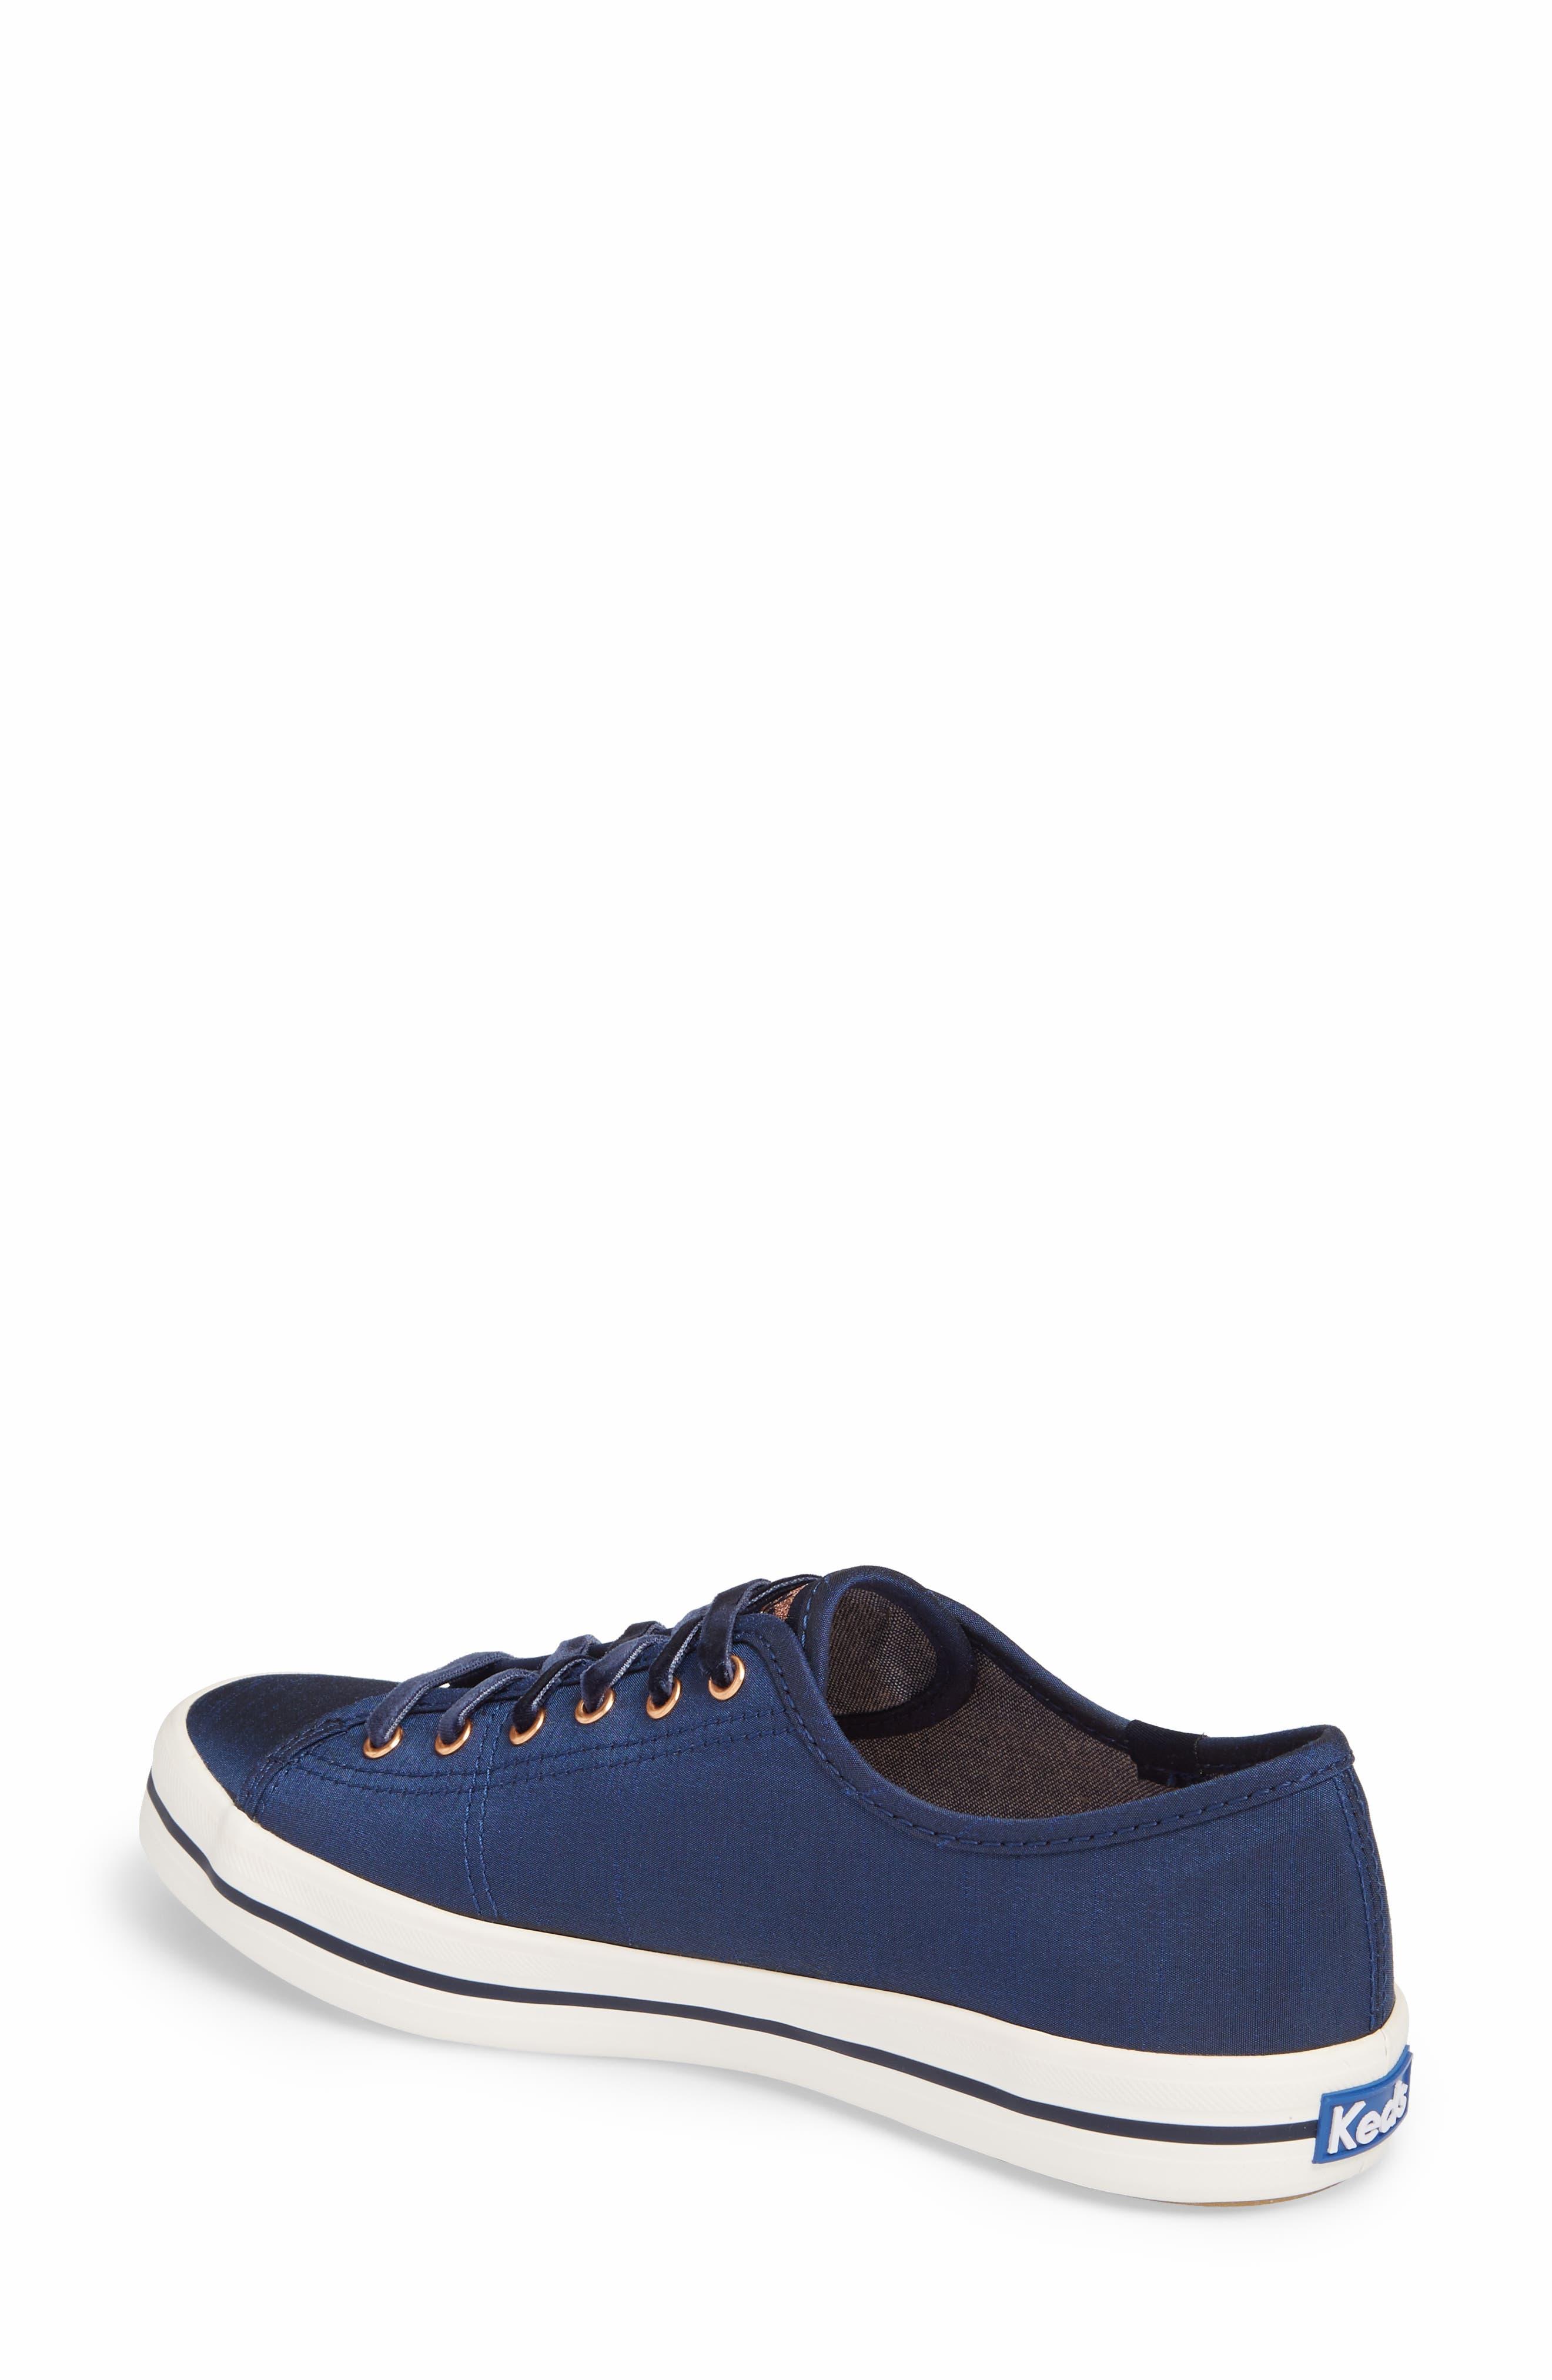 Kickstart Sneaker,                             Alternate thumbnail 2, color,                             Navy Satin